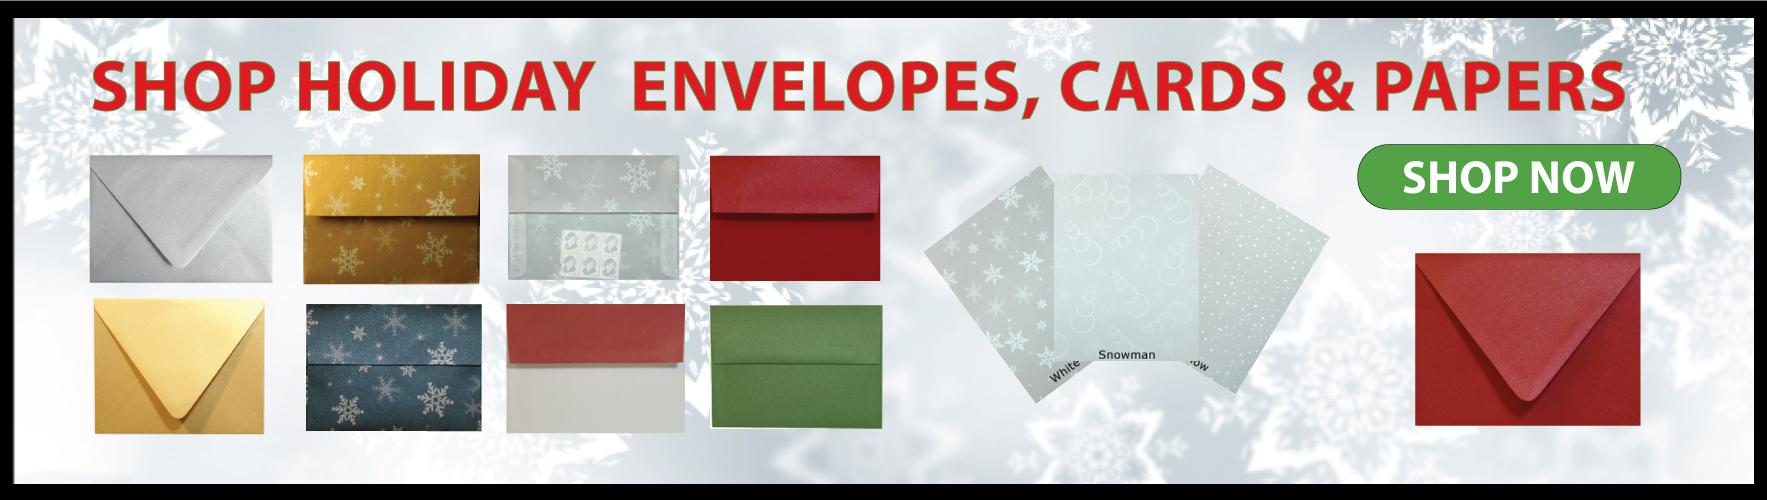 Shop Holiday Envelopes